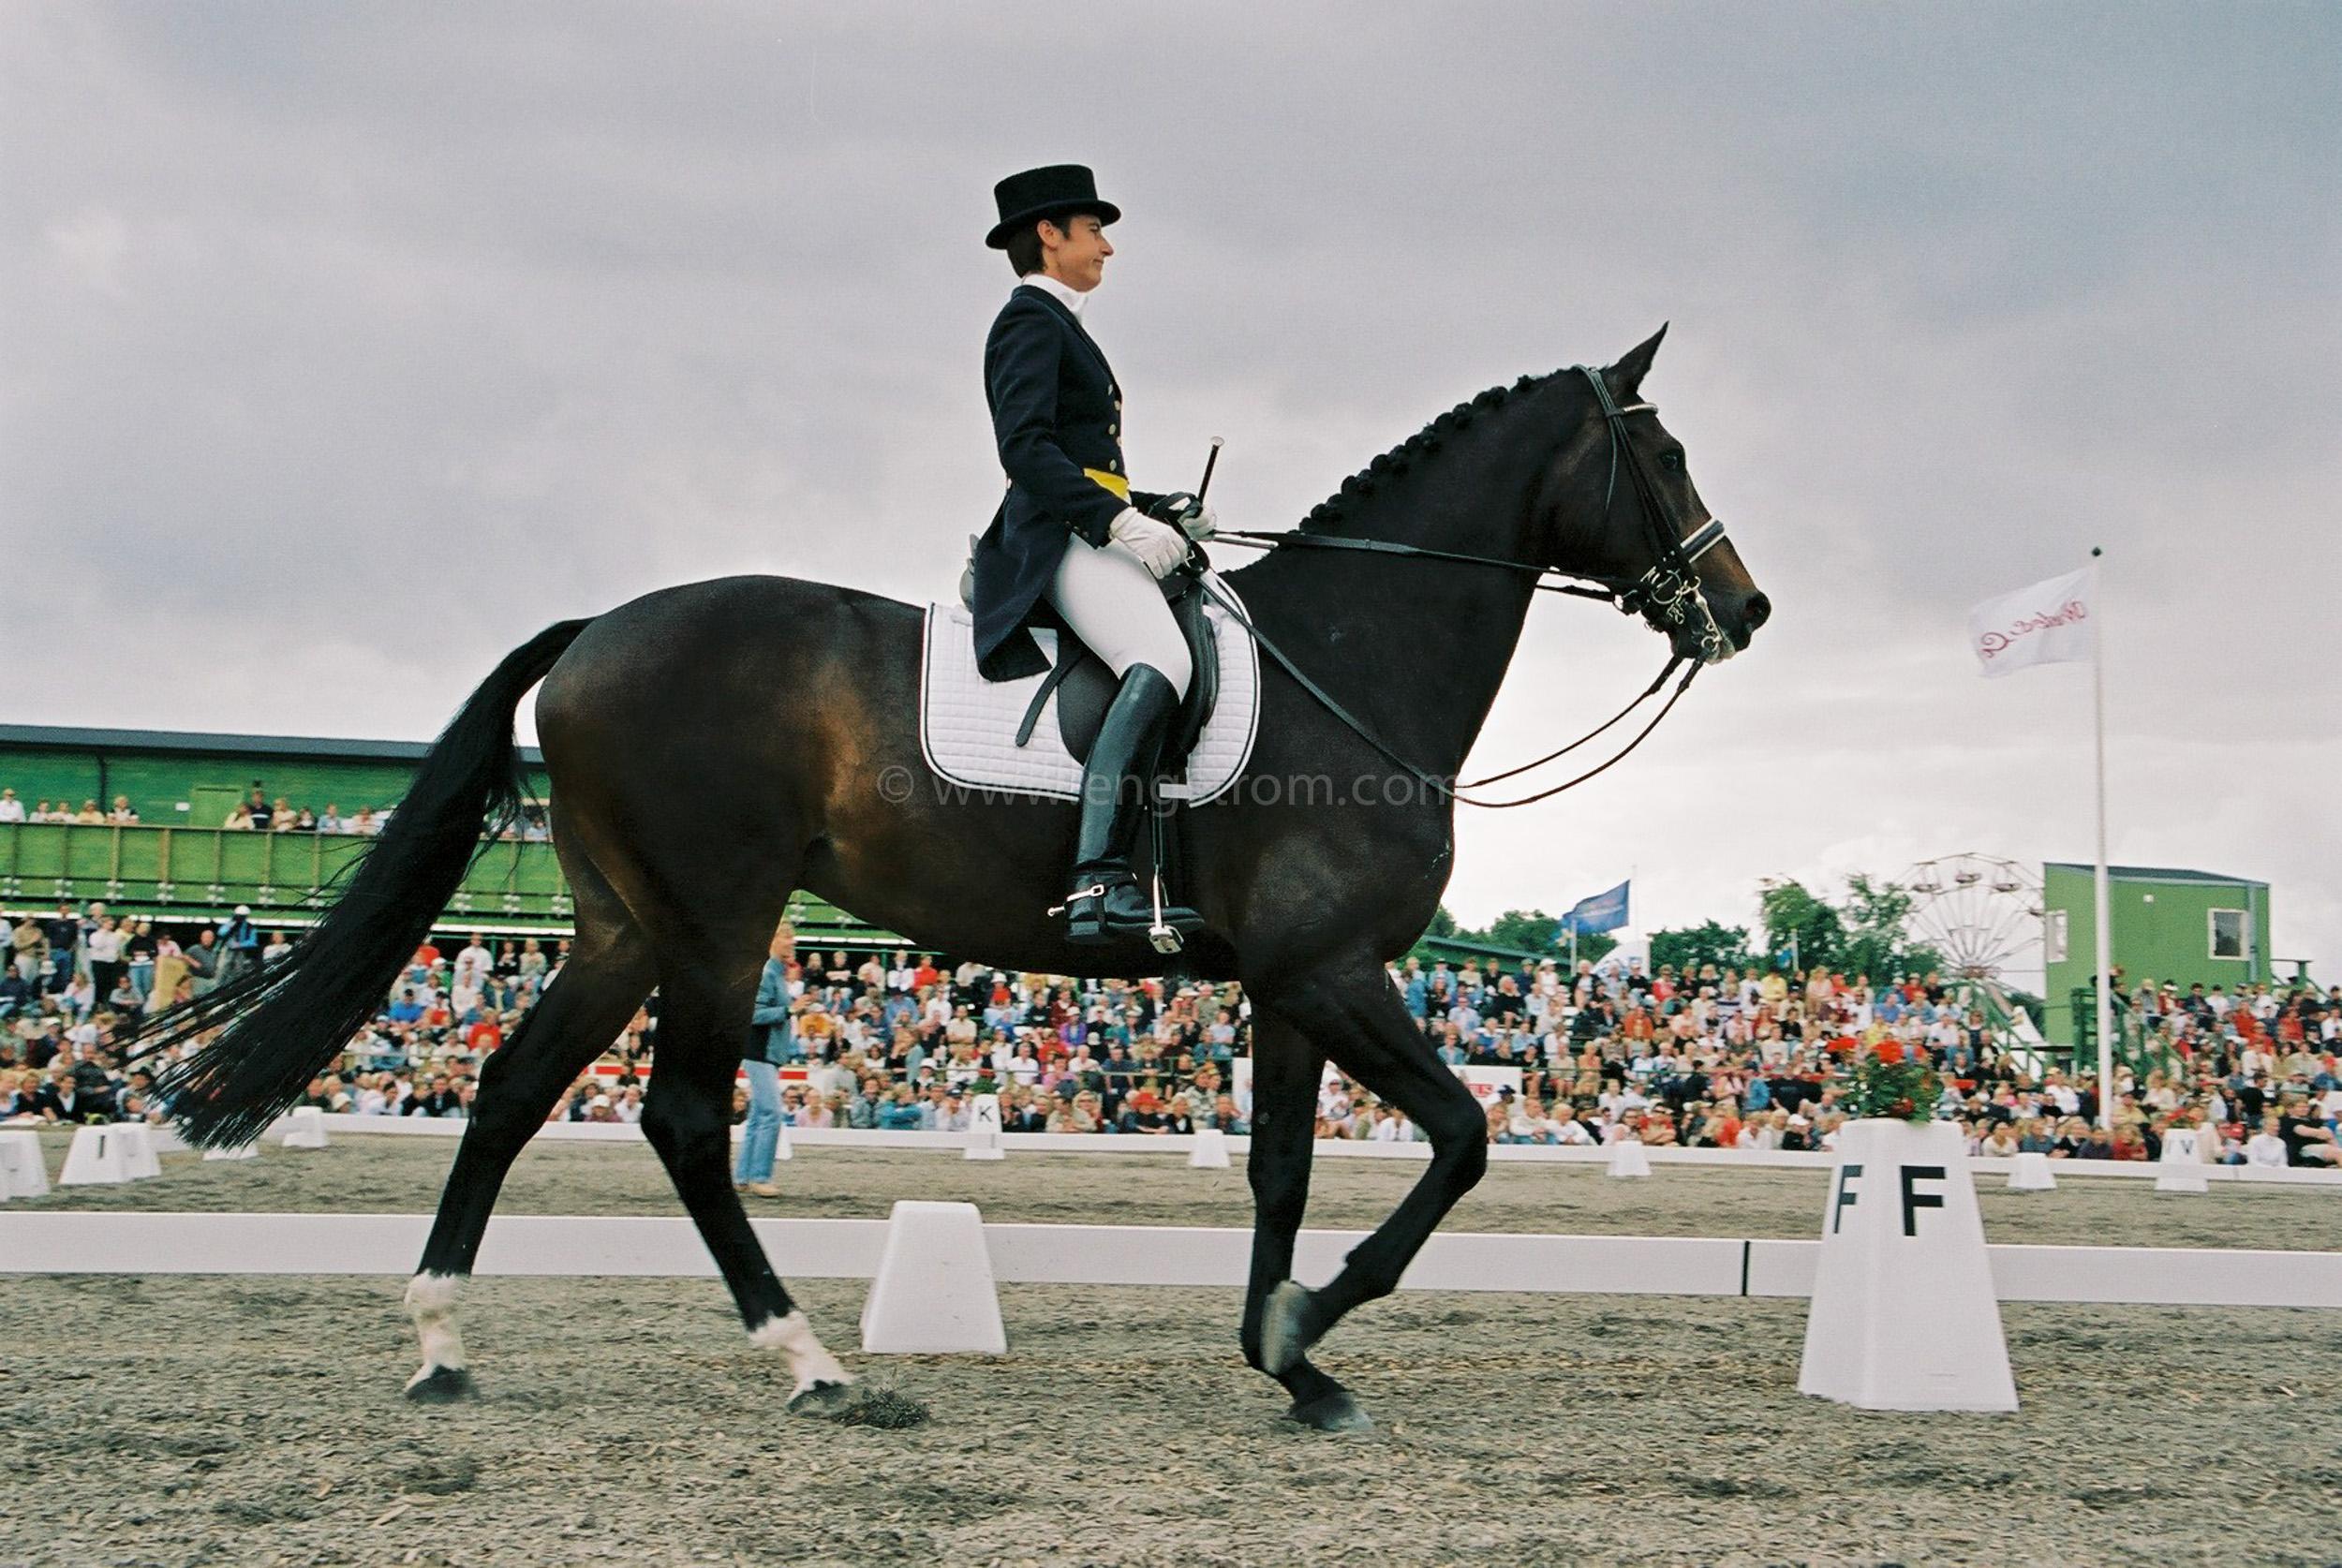 JE0314_07, Dressyrhäst på Falsterbo horseshow, Jonas Engström